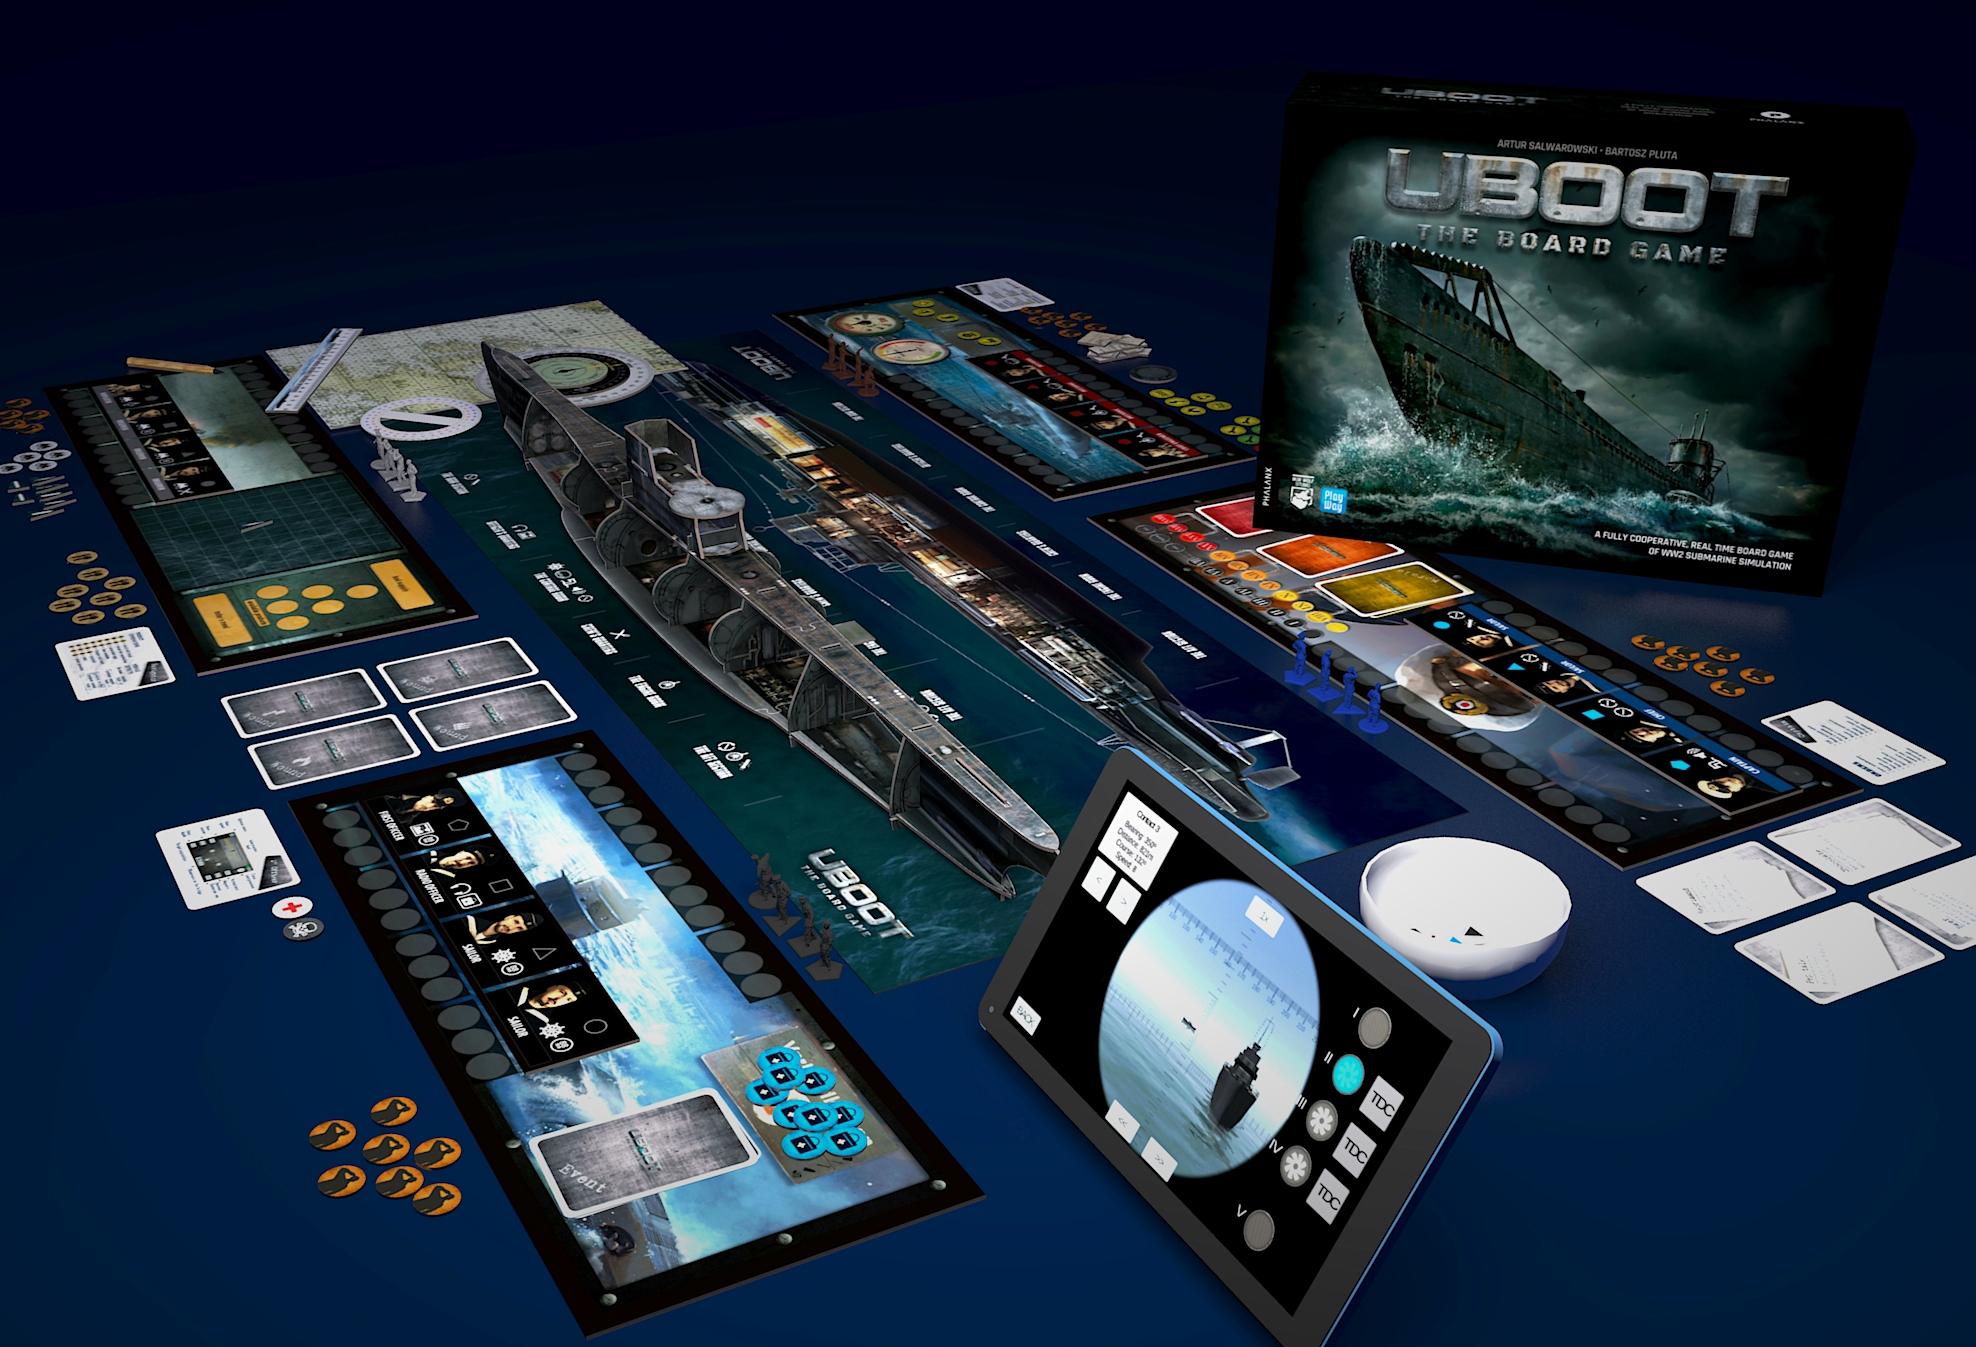 UBOOT-The-Board-Game-pic2.jpg